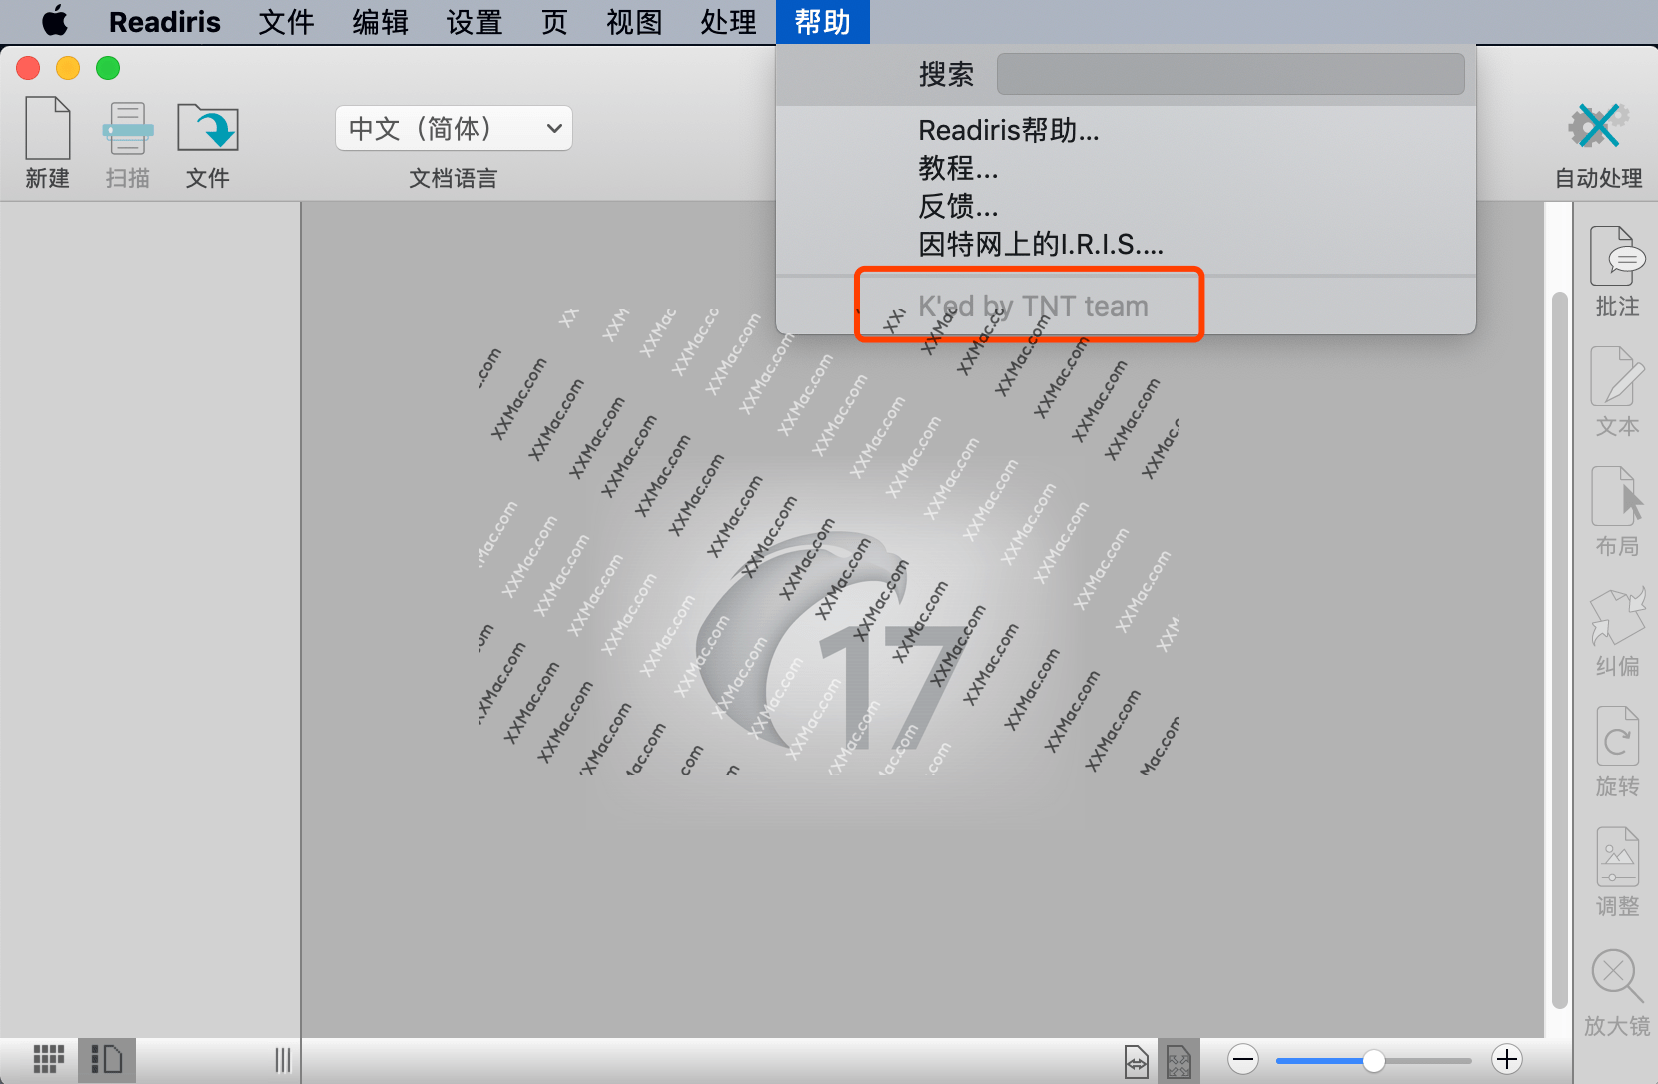 Readiris Pro for Mac v17.1.4 中文破解版下载 OCR识别软件